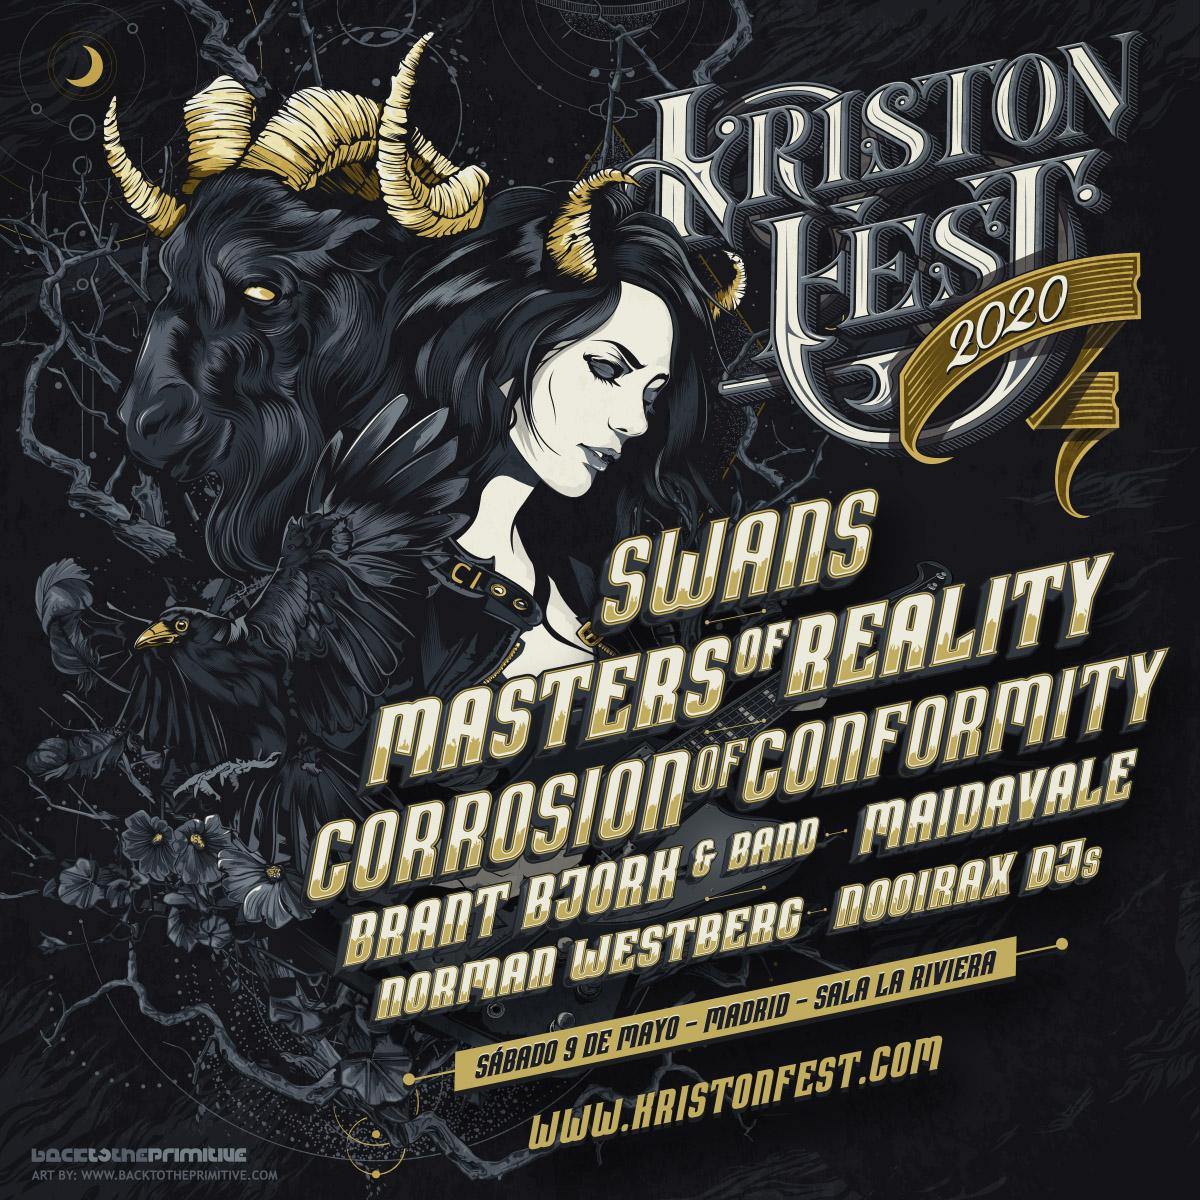 kristonfest 2020 poster